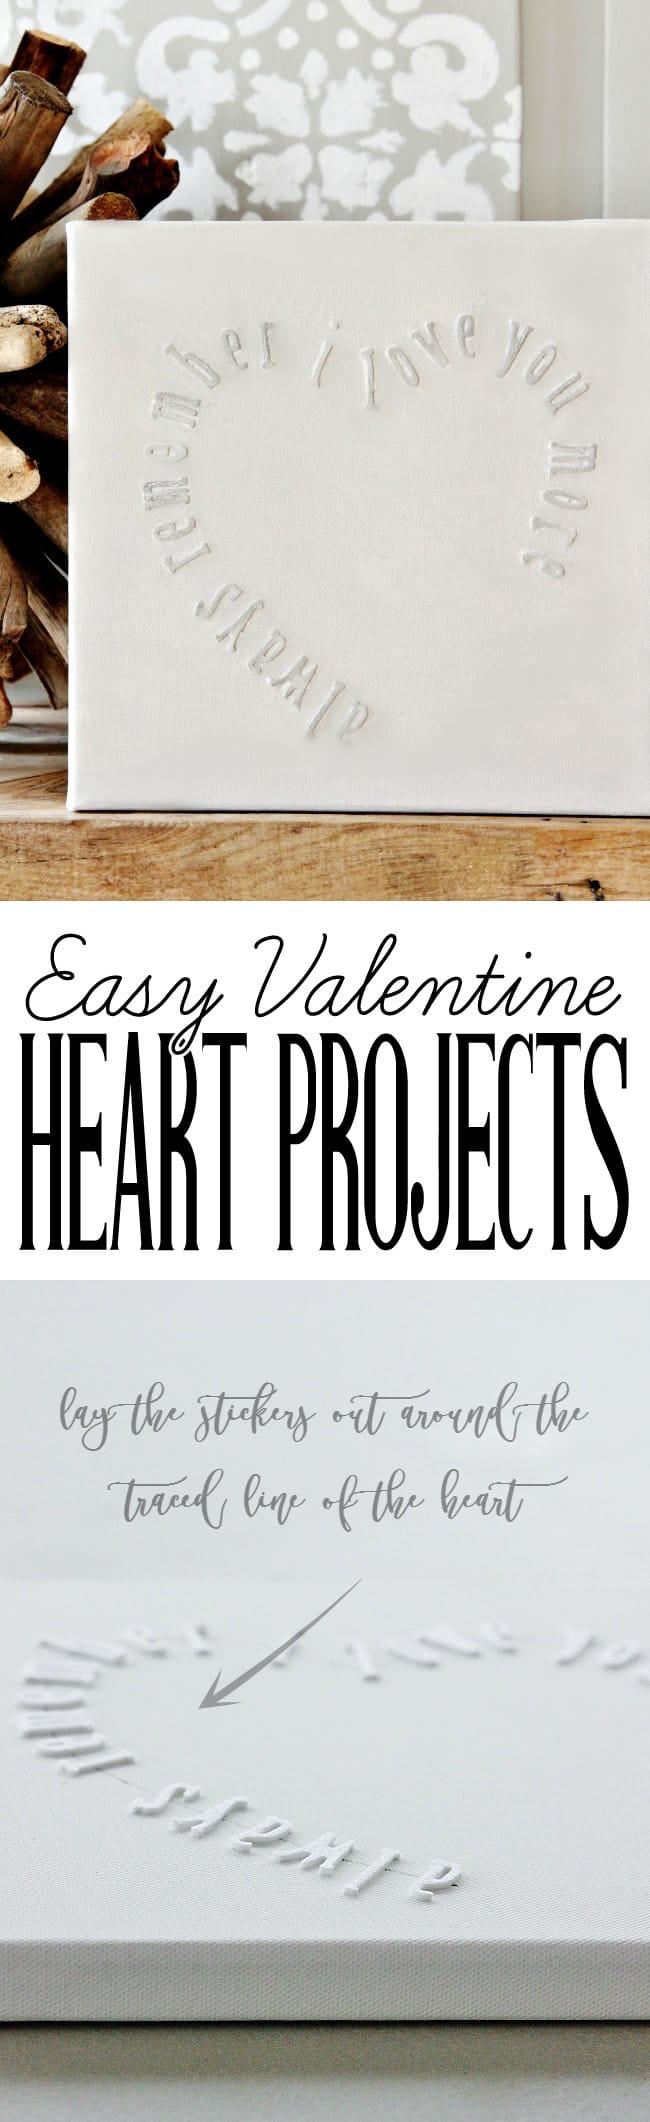 diy-valentines-heart-TOWER